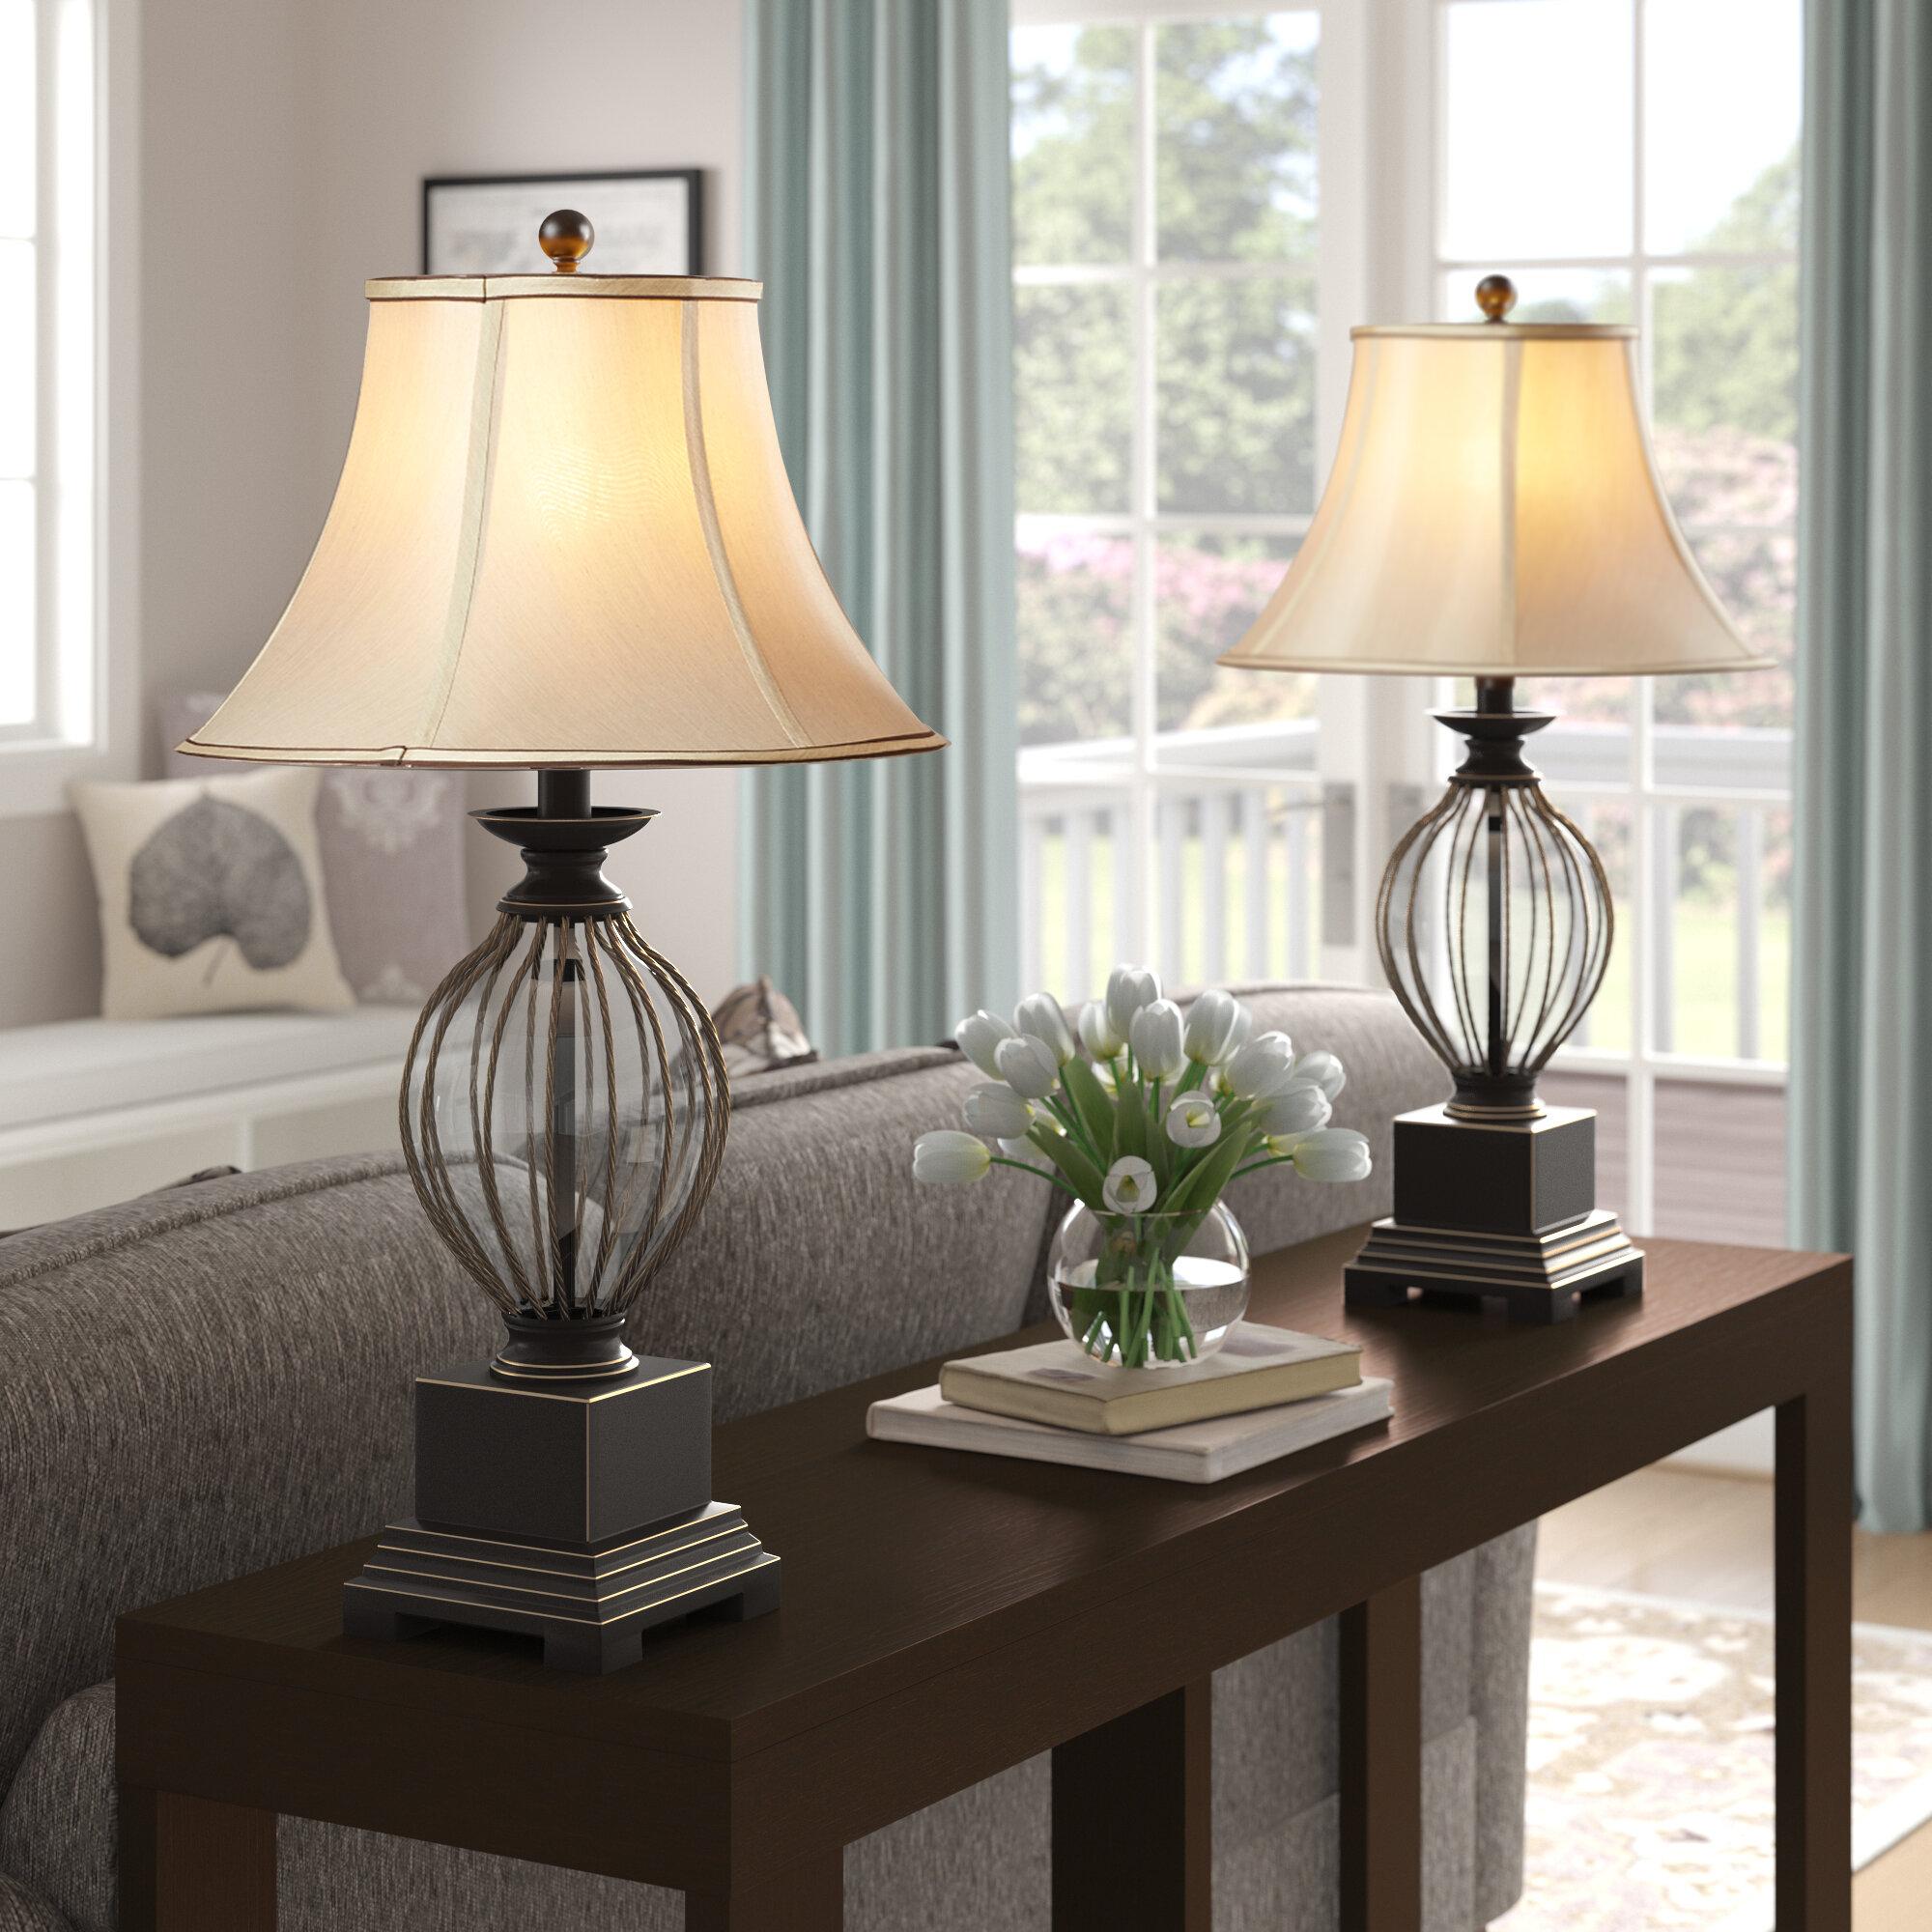 Buy Cheap Nordic Marble Led Table Lamps Living Room Long Pole Office Reading Aisle Desk Light Iron Ball De Bedside Bedroom Table Lights Street Price Led Lamps